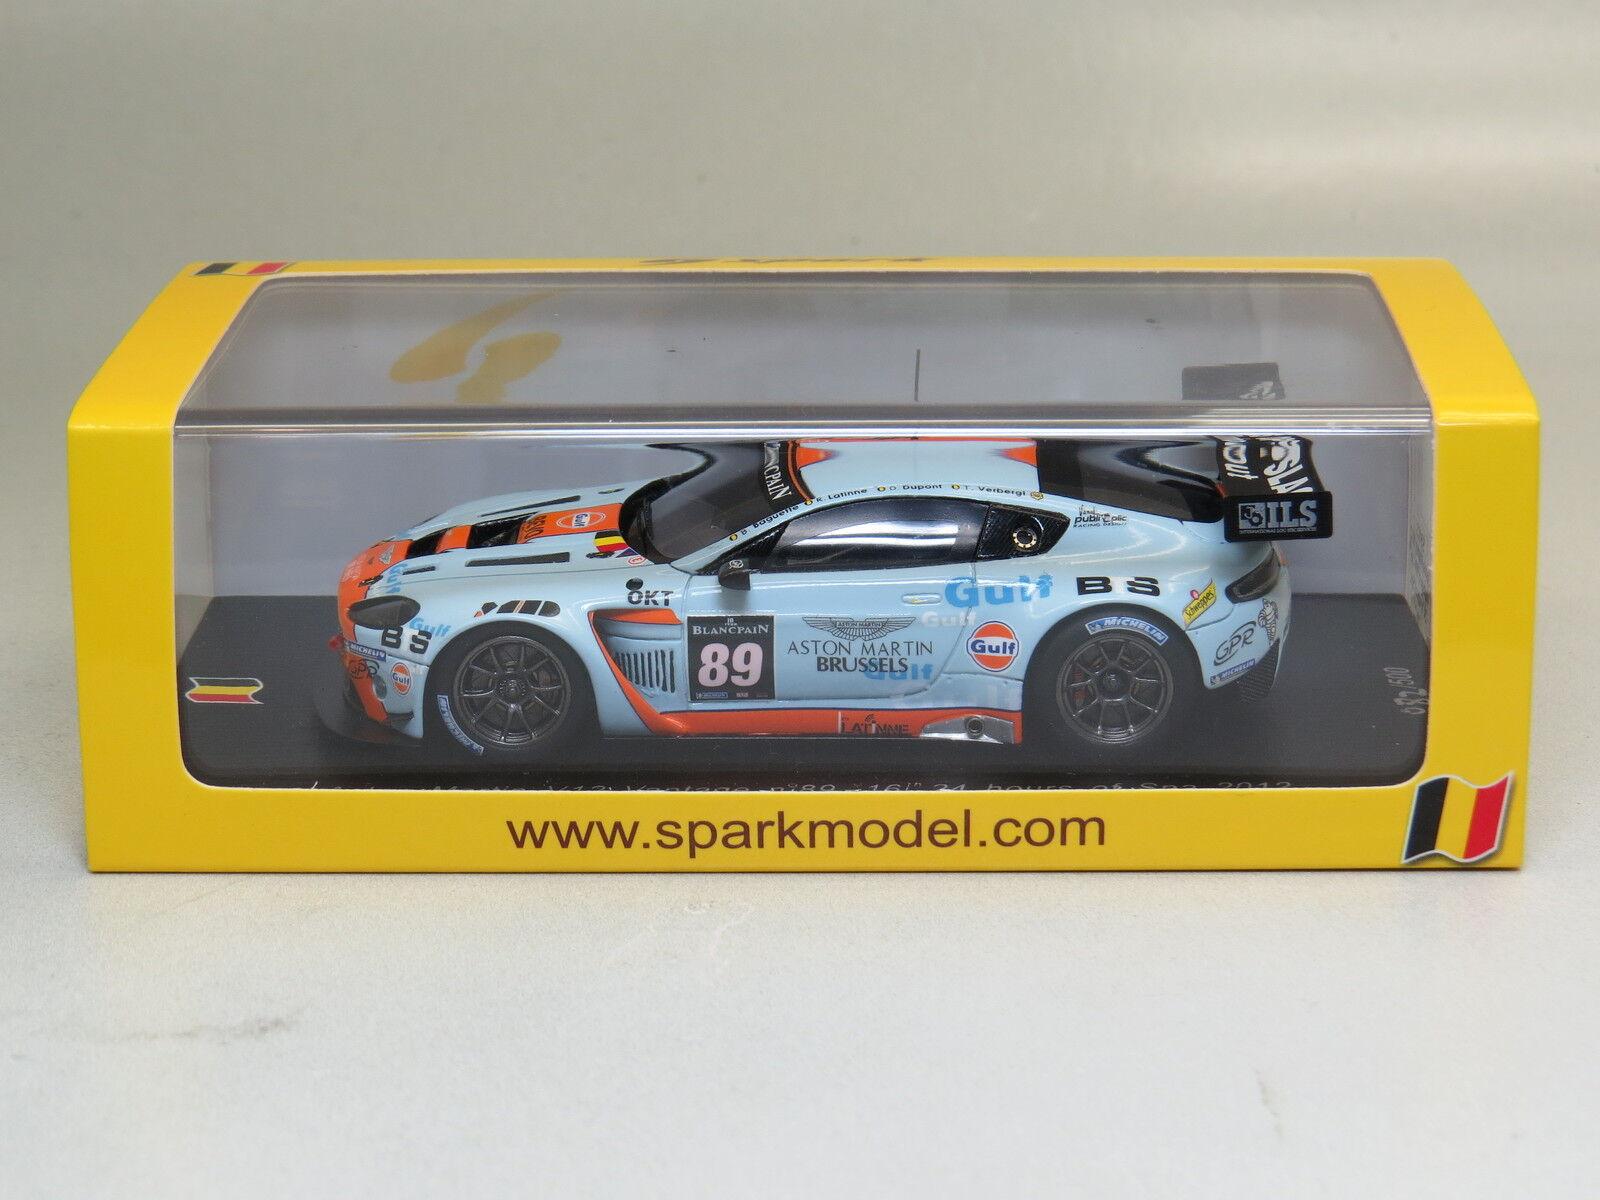 Spark SB033 Aston Martin V12 24 Hours of Spa 2012 1 43 Vantage nº89 16th